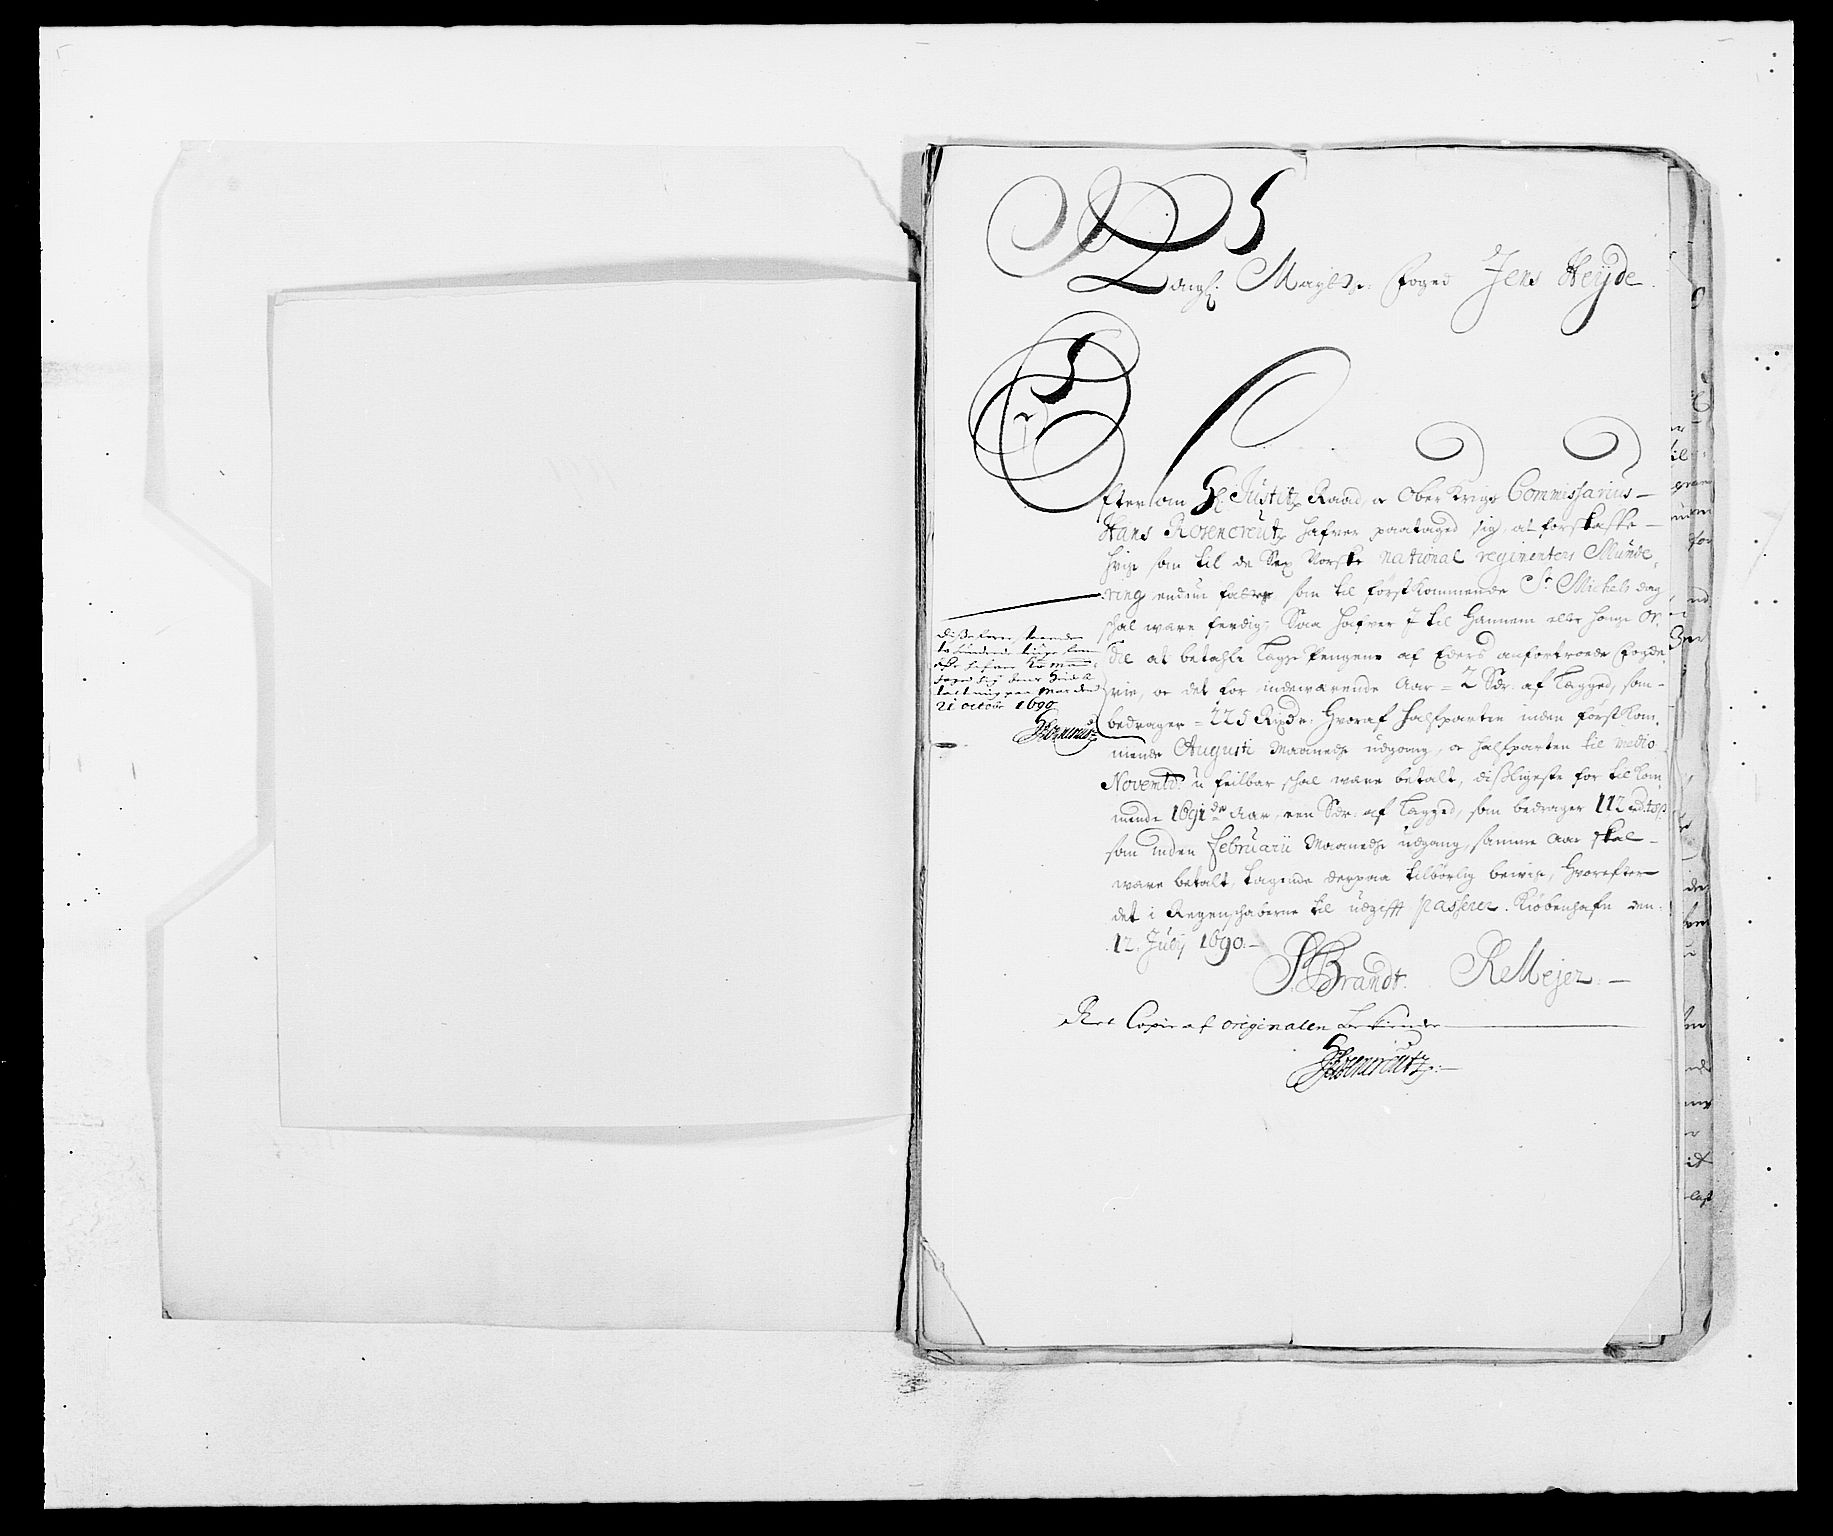 RA, Rentekammeret inntil 1814, Reviderte regnskaper, Fogderegnskap, R09/L0436: Fogderegnskap Follo, 1685-1691, s. 180